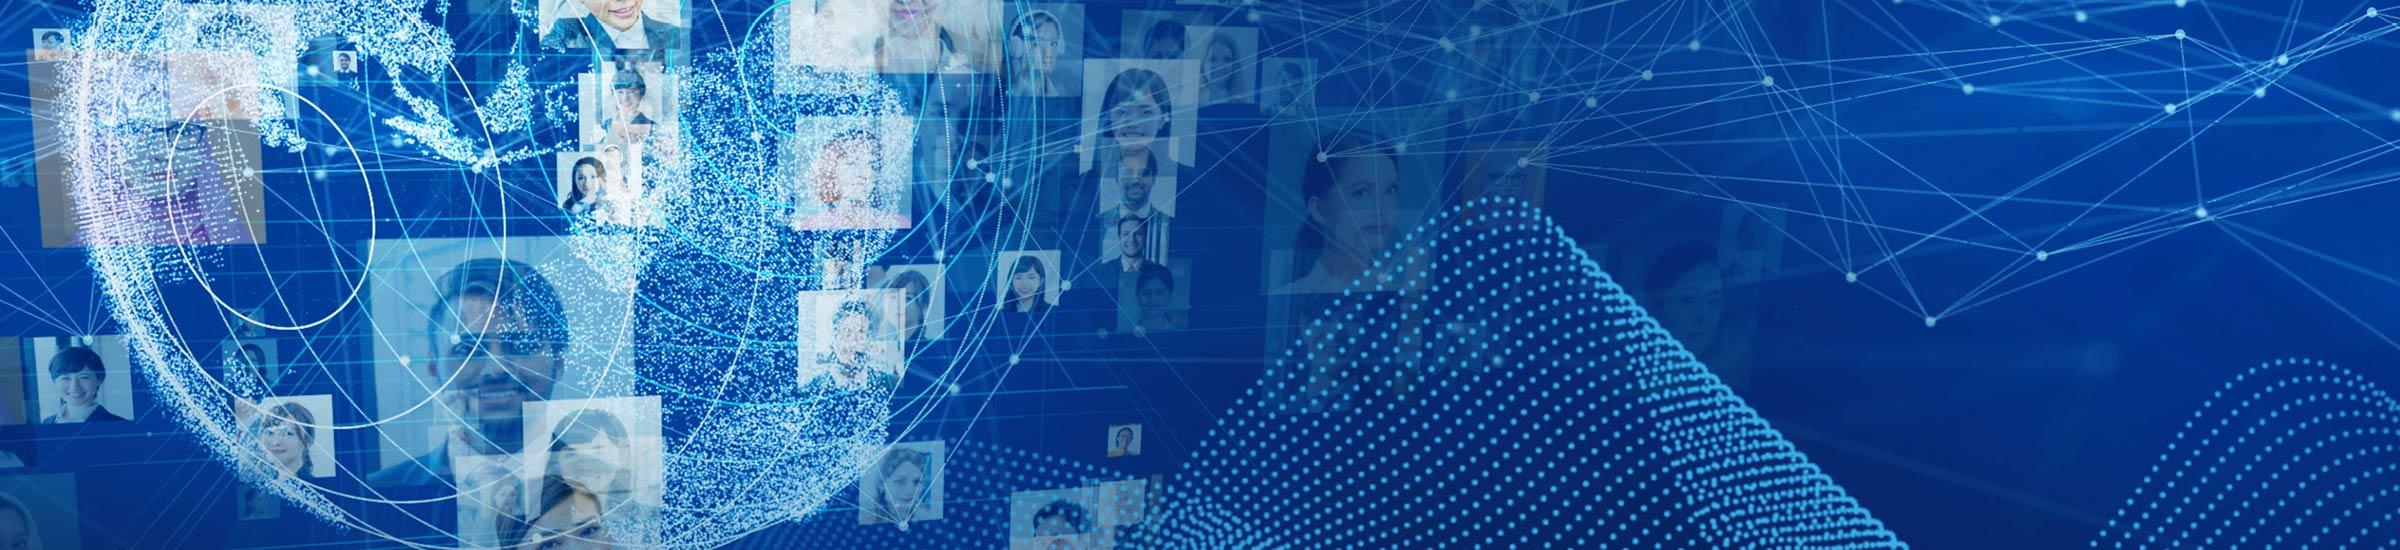 Enterprise Governance, Risk, and Compliance Solution